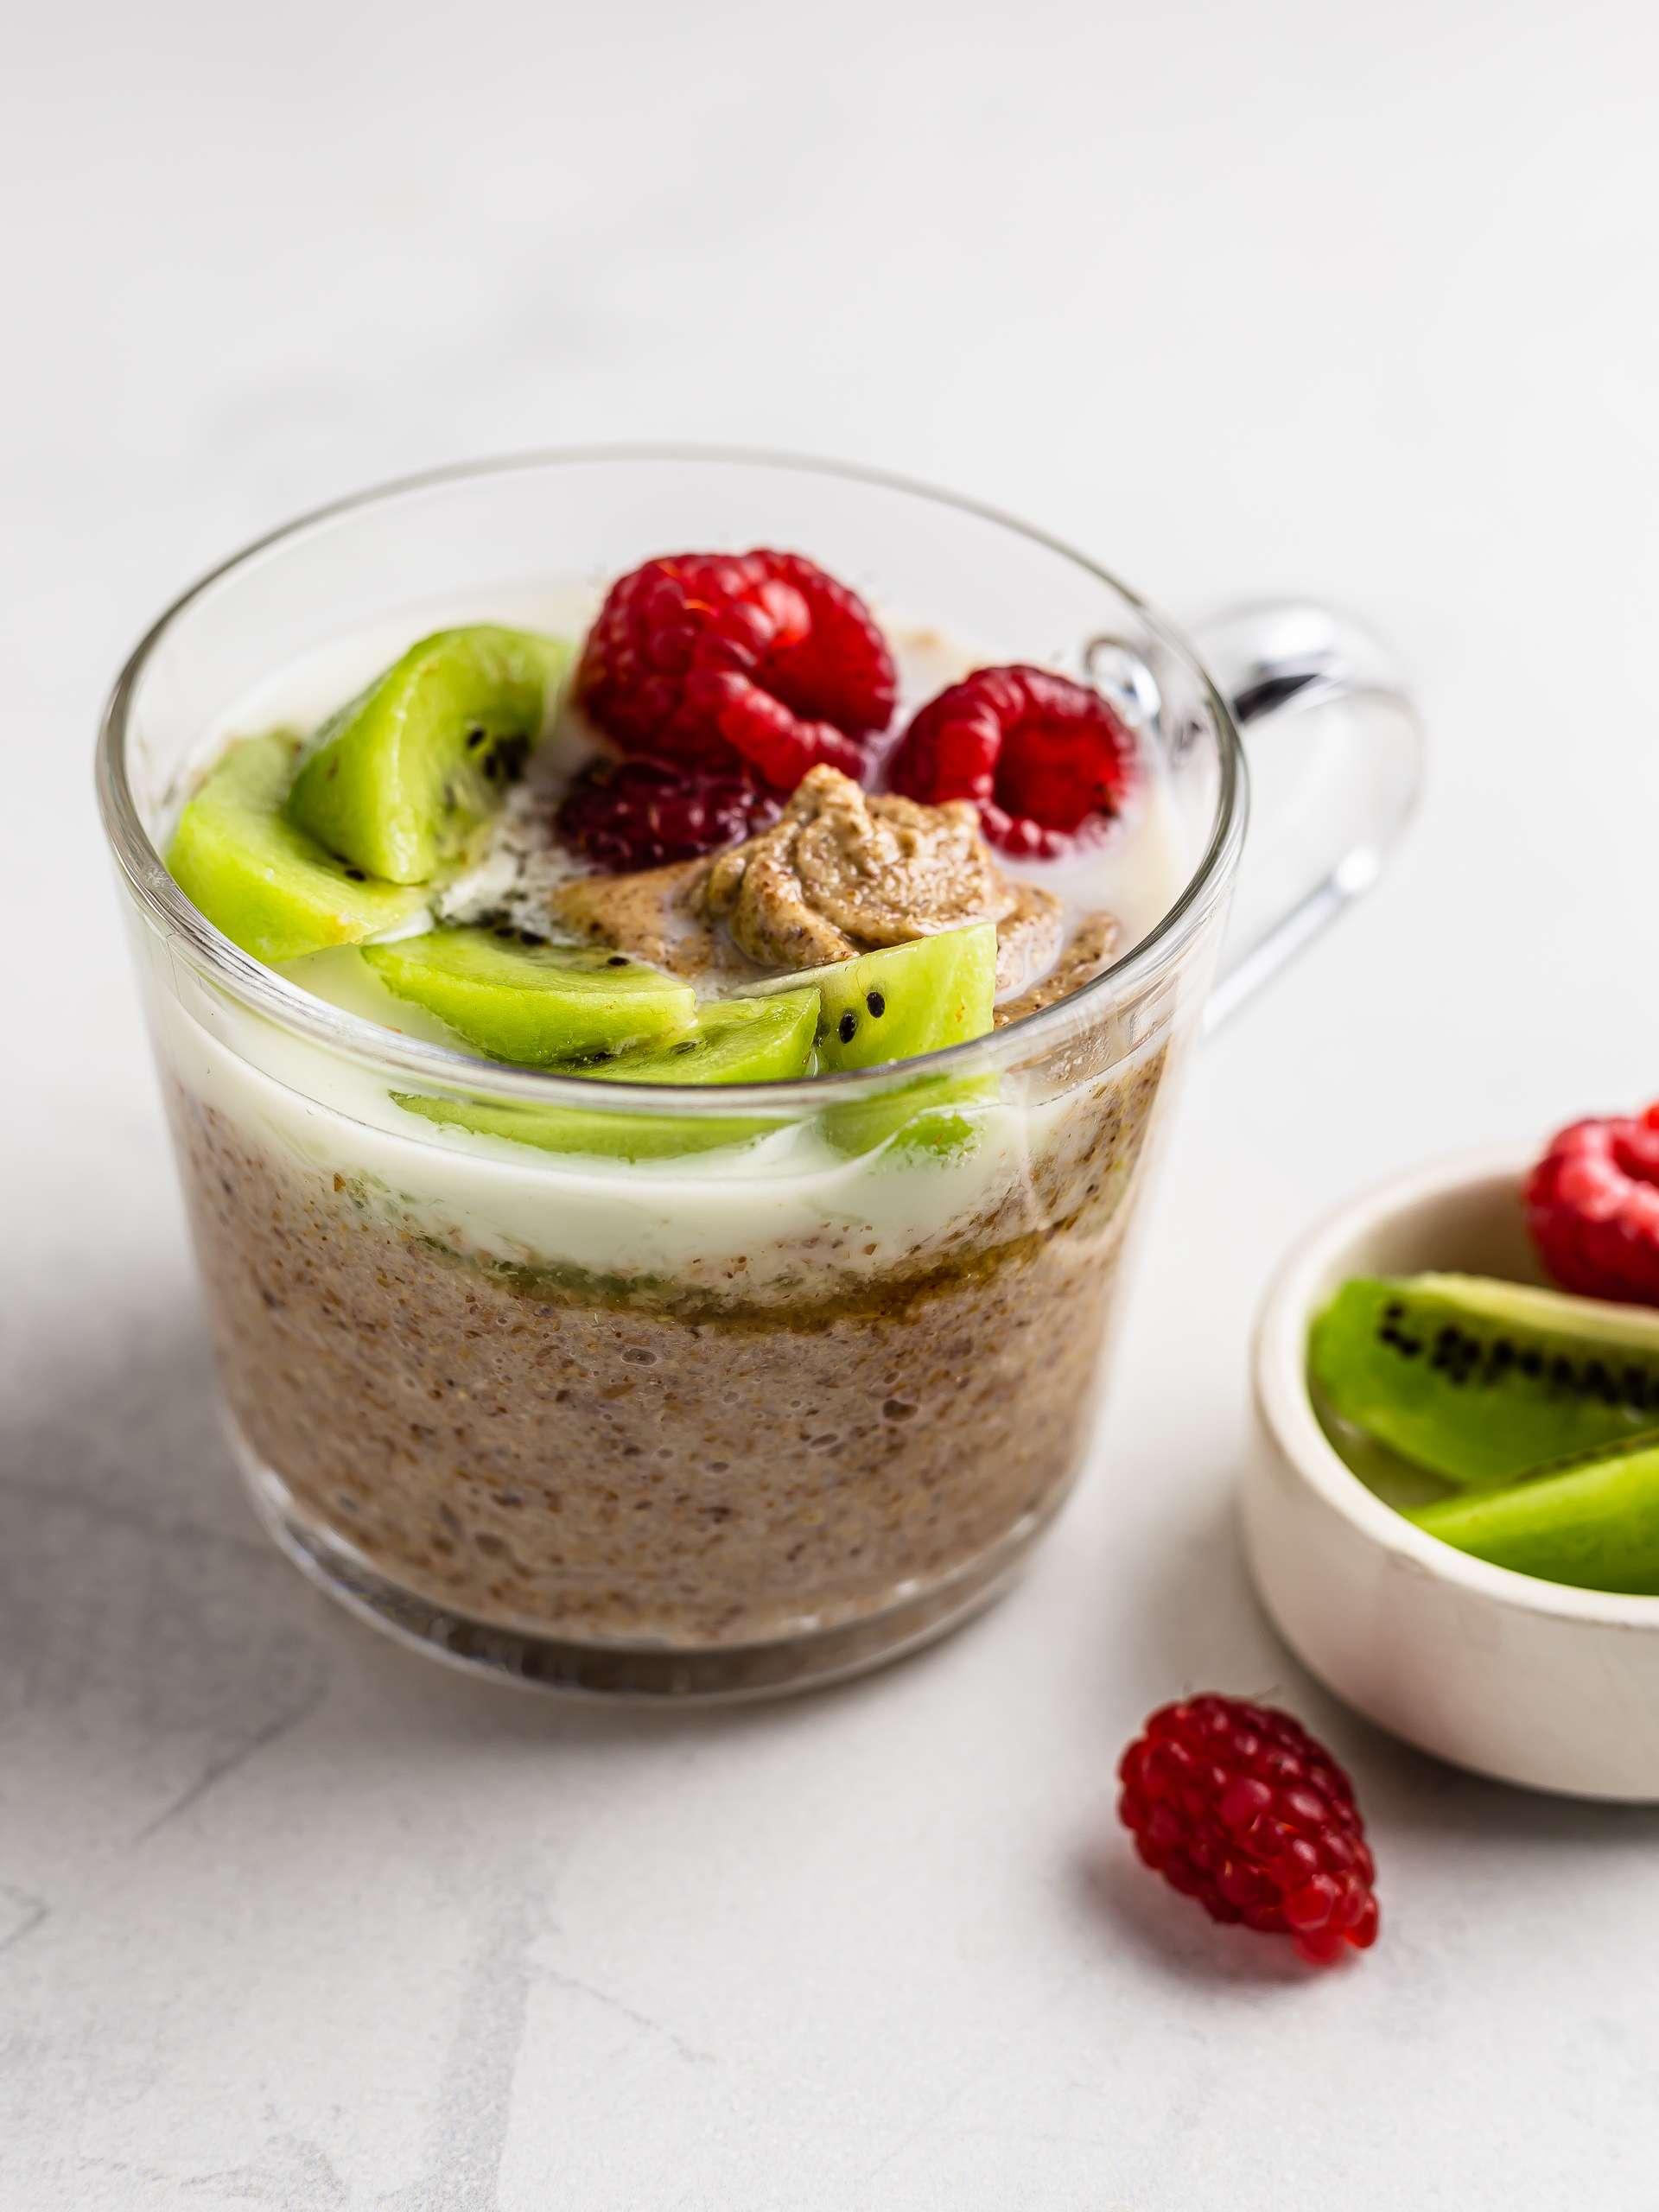 buckwheat porridge topped with raspberries and kiwi